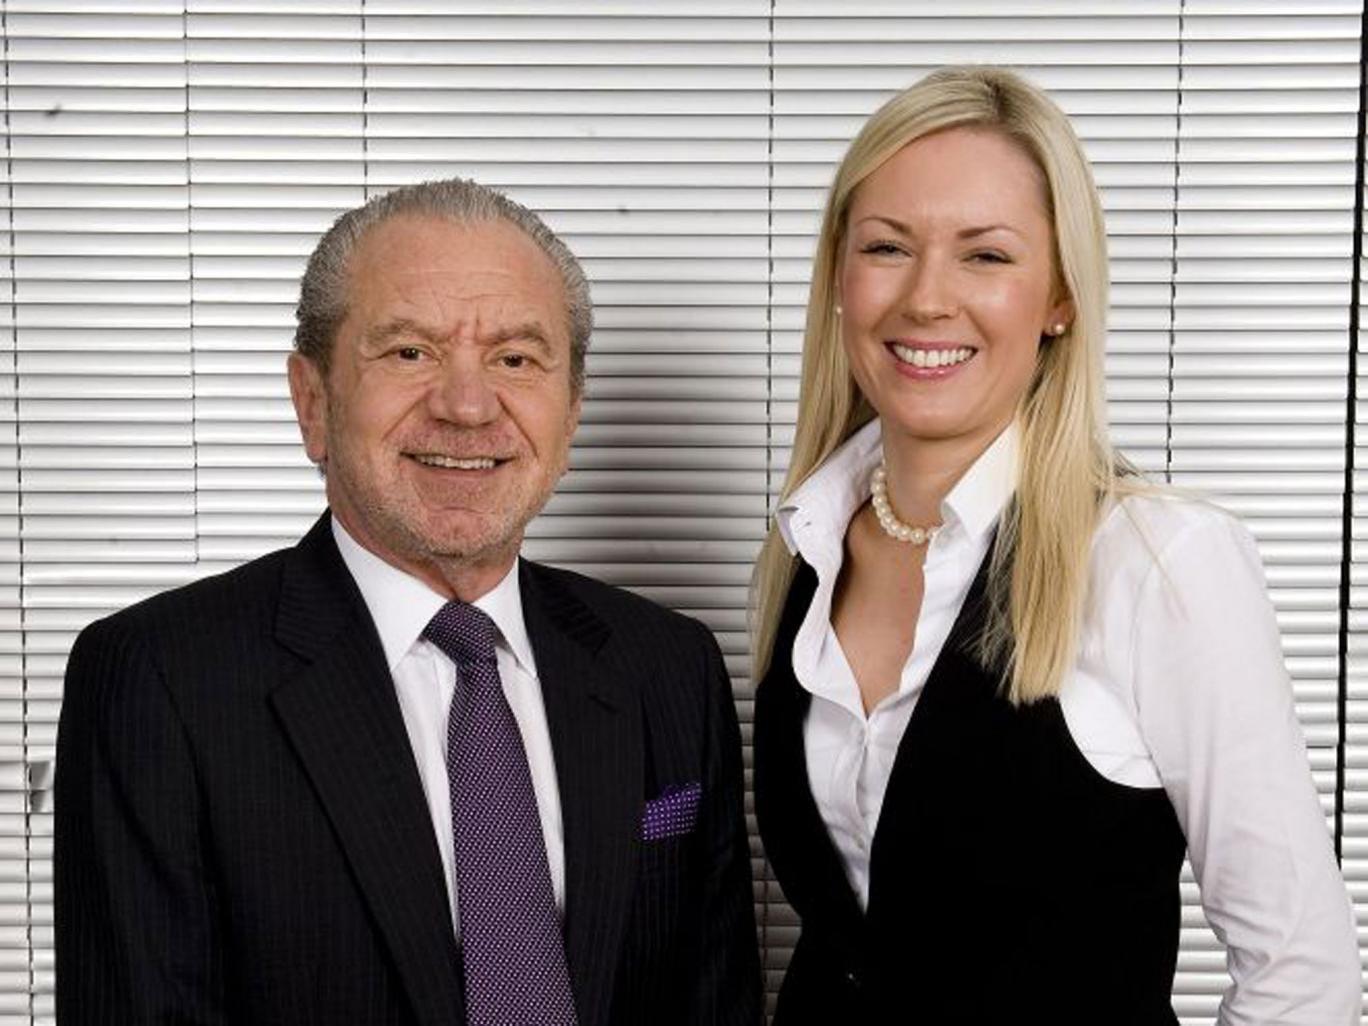 Former Apprentice winner Stella English has lost her claim of constructive dismissal against businessman Lord Sugar.